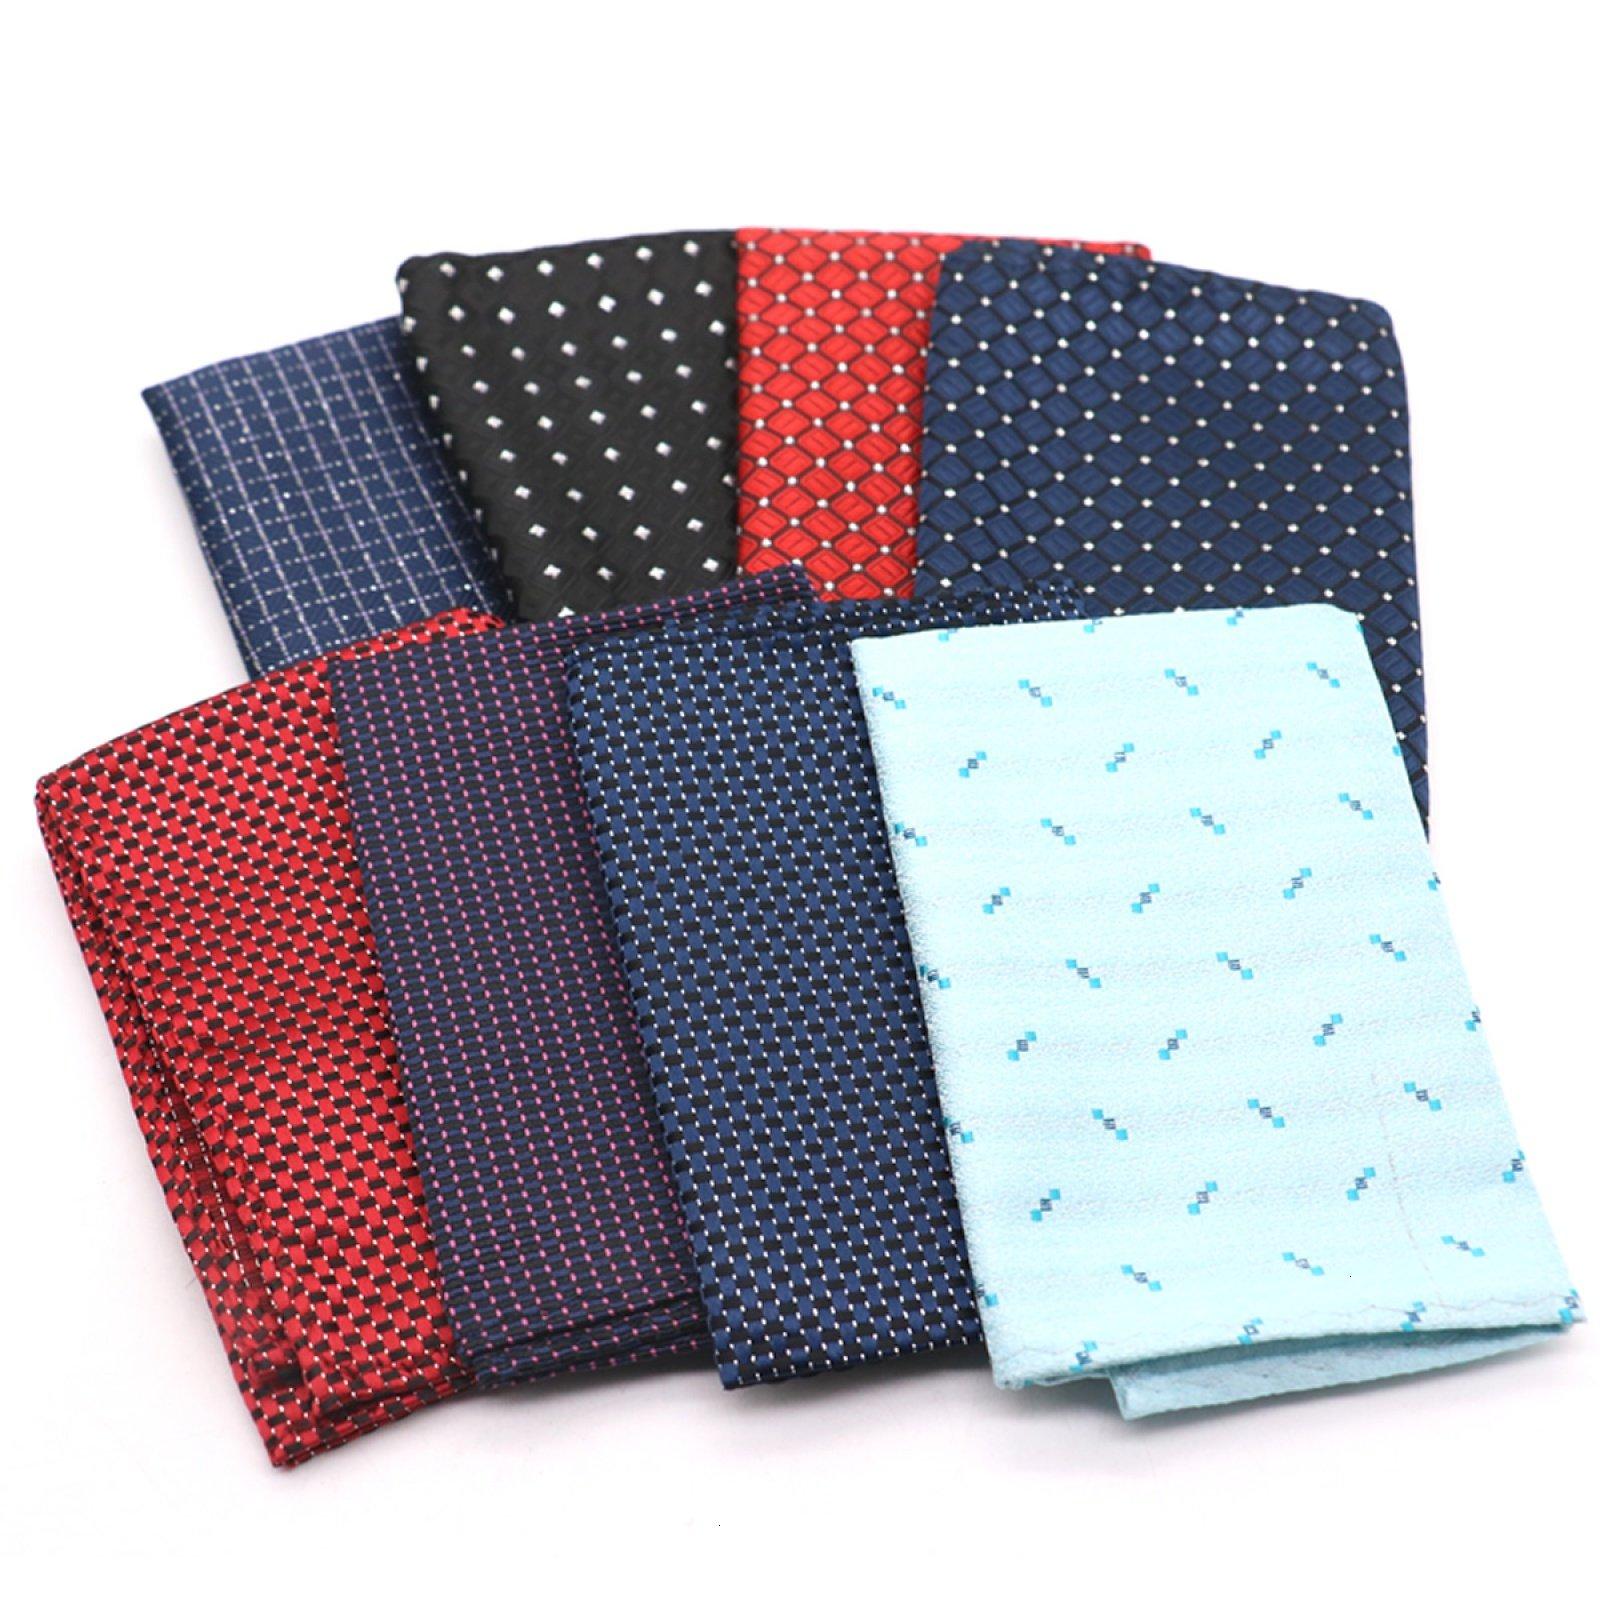 MAISHO 8 Pack Assorted Flash Dots Pocket Square Handkerchief Hanky For Men